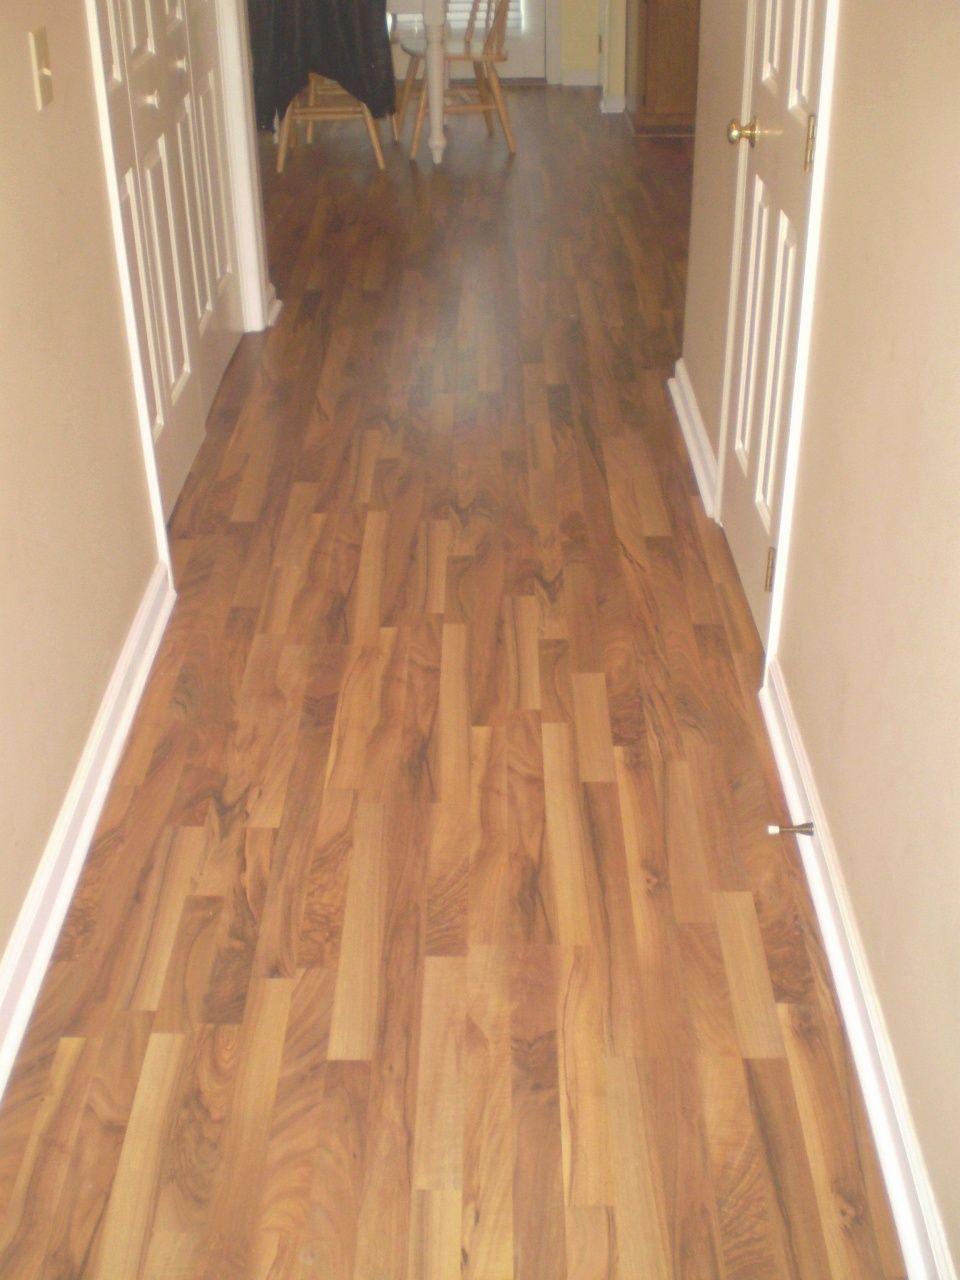 Laminate Flooring Vs Engineered Hardwood in 2020 Bamboo